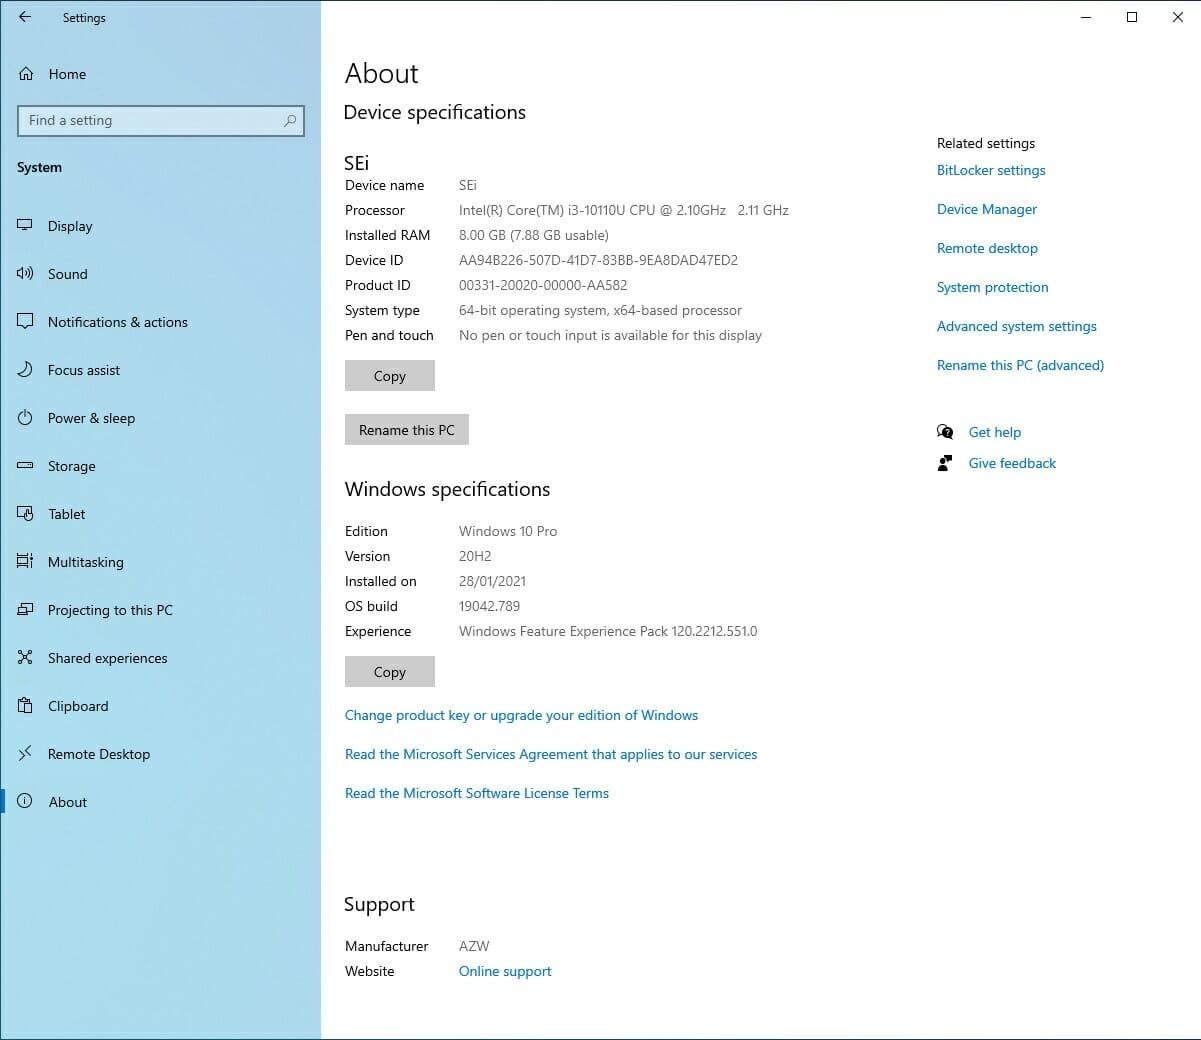 windows 10 info after update